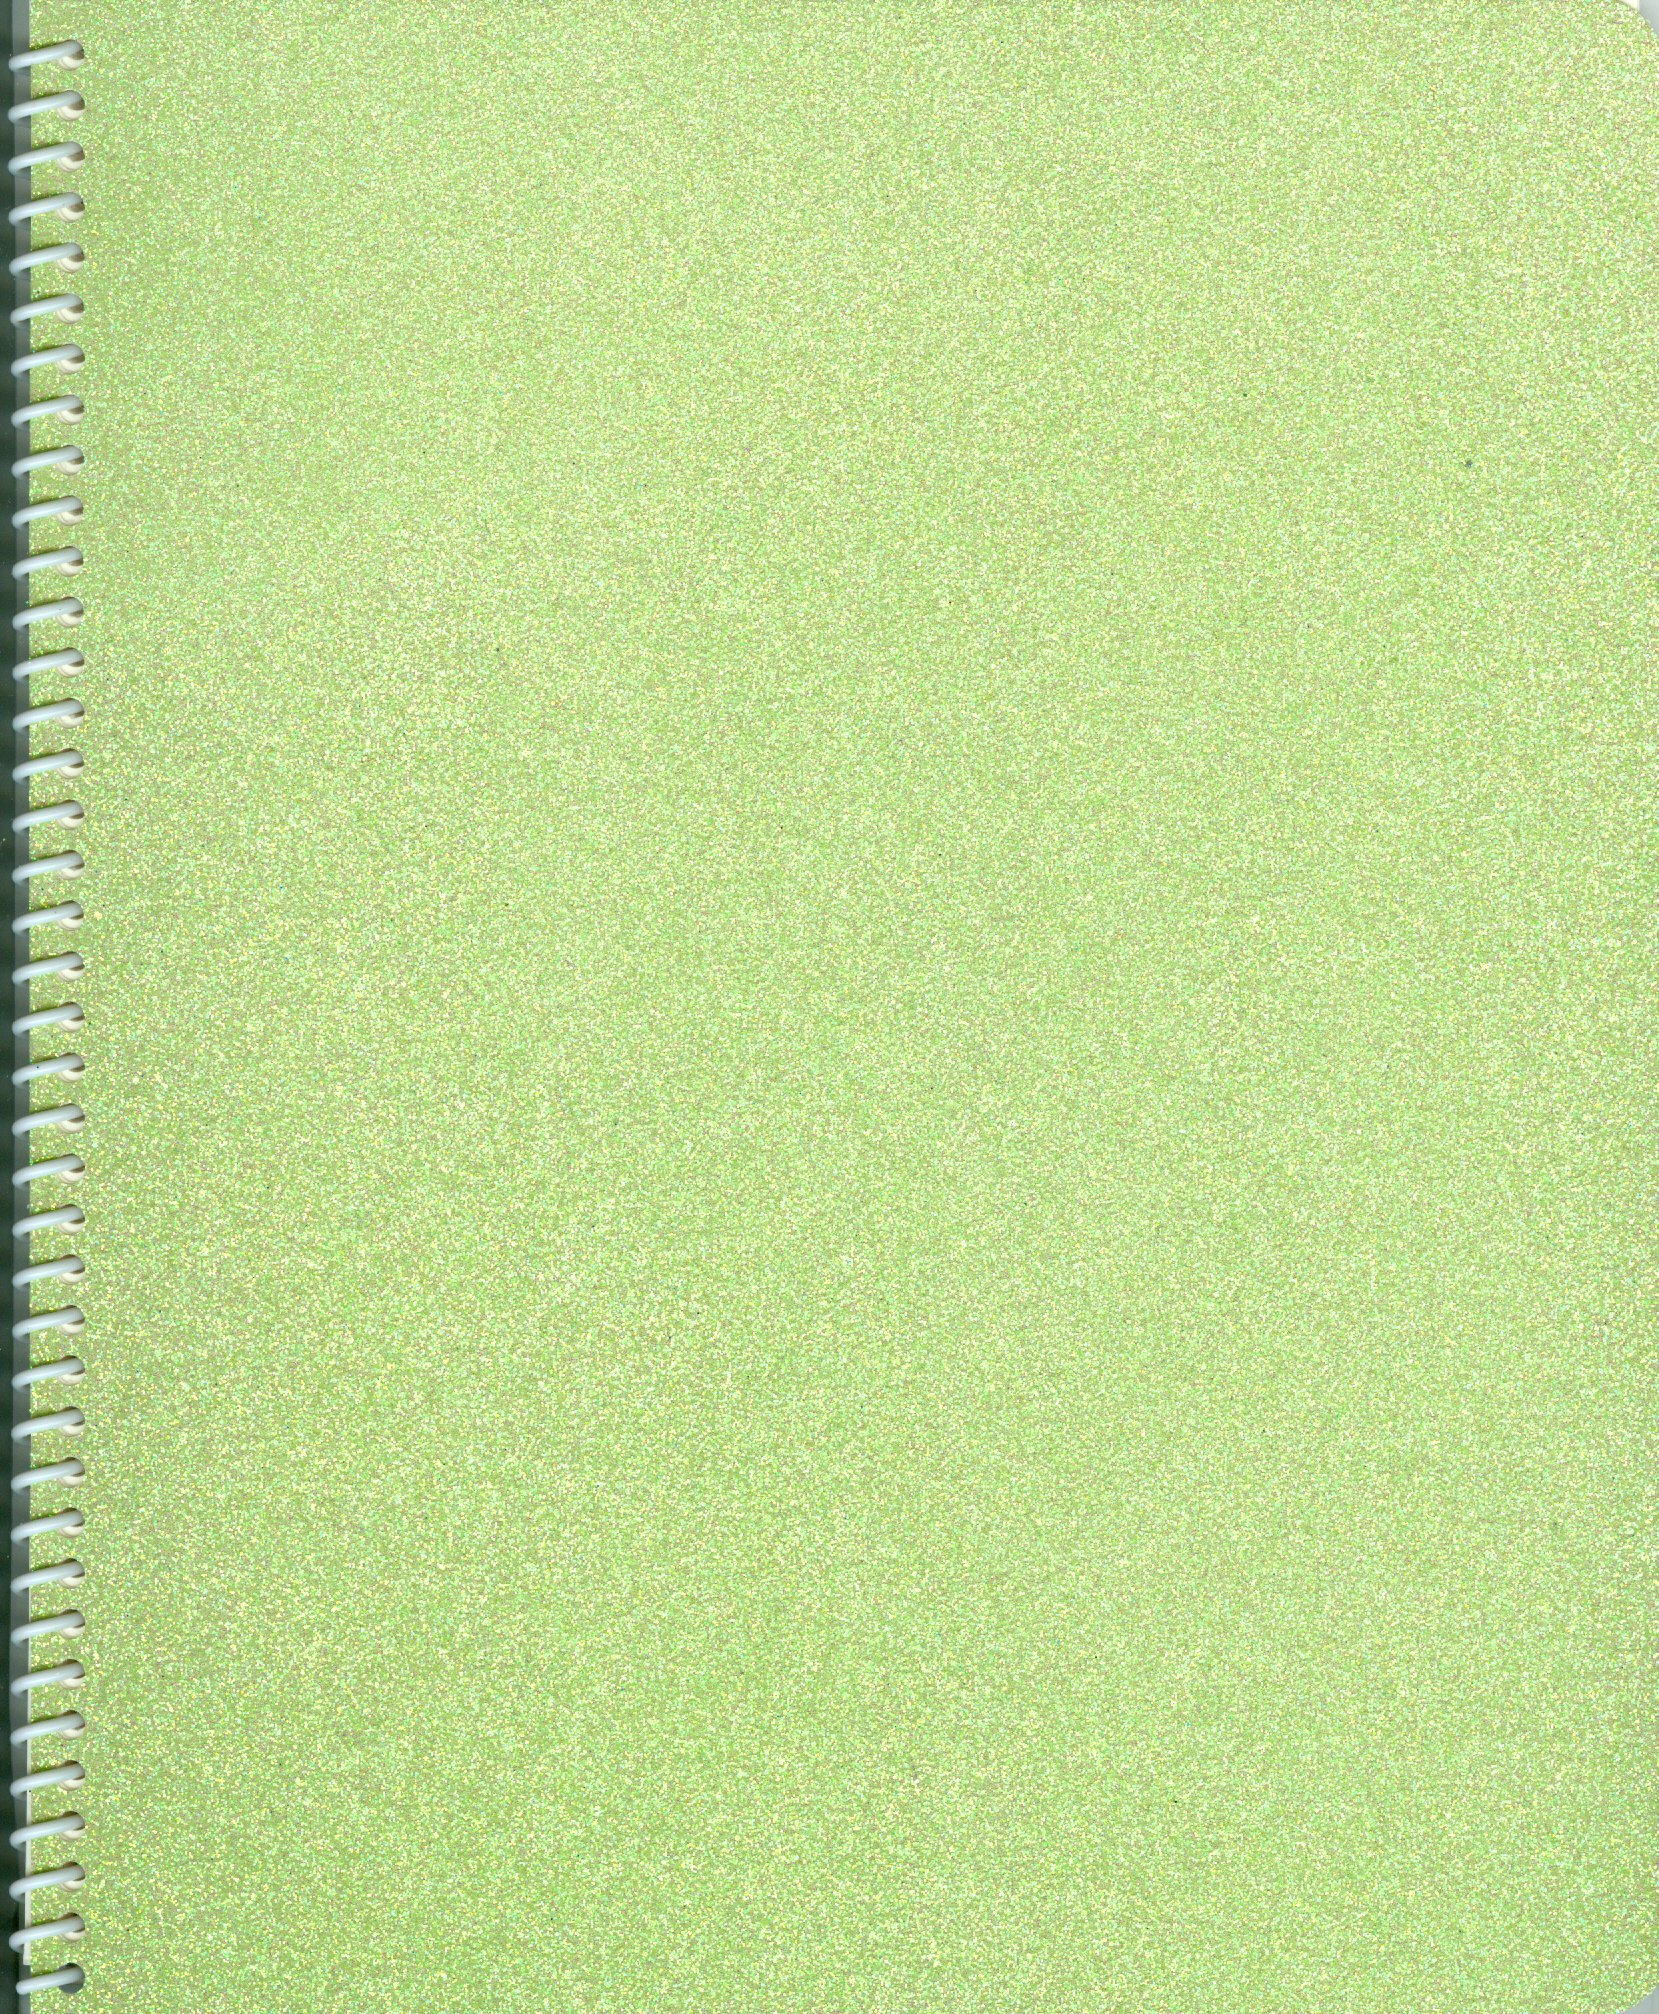 Sticker Collecting Album 5x7'' Pretty Pale Pastel Green Sparkle Glitter, Re-usable